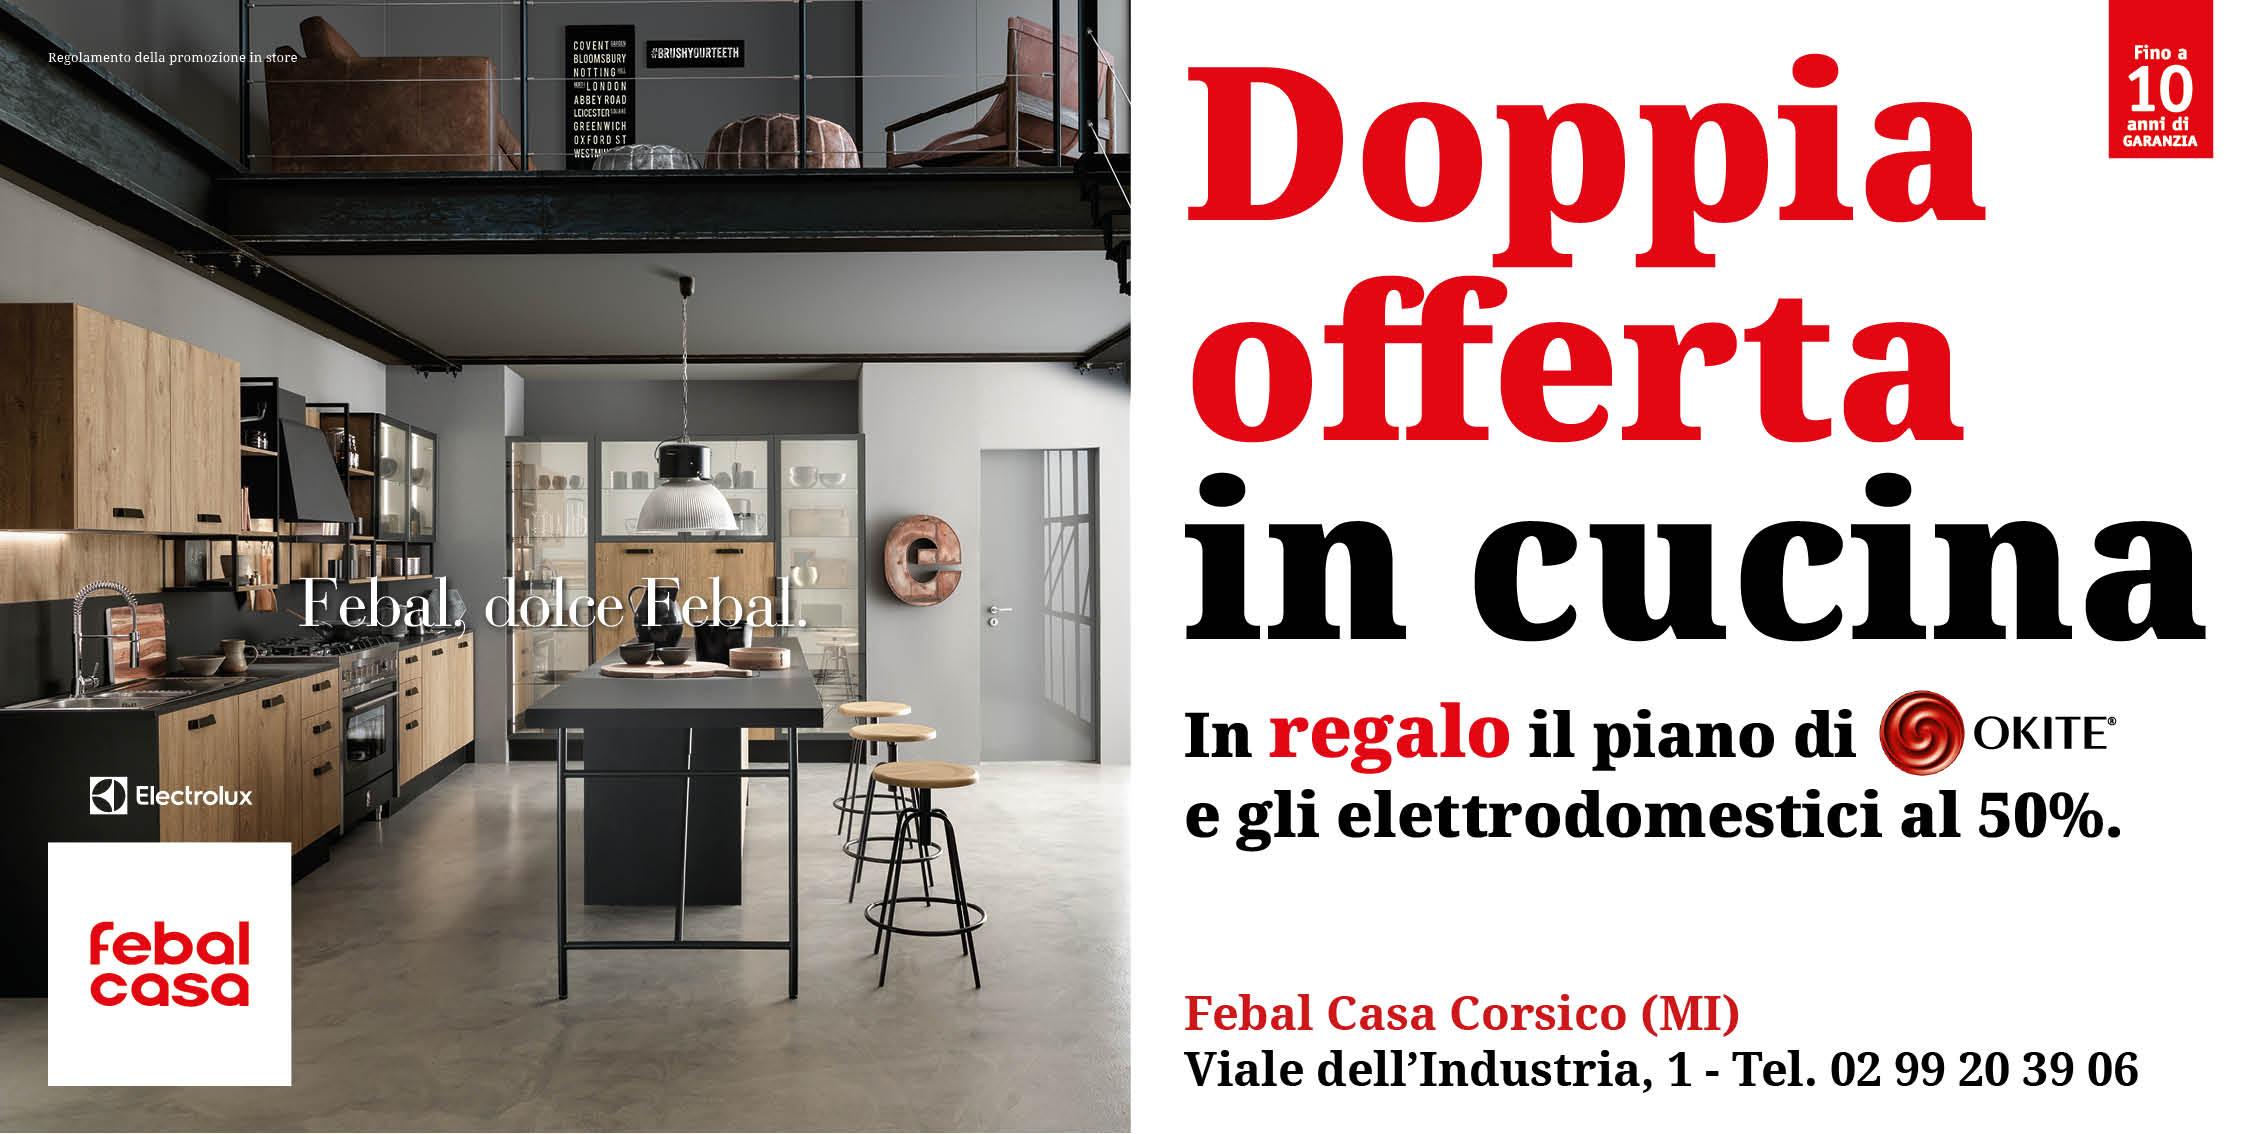 6x3_FC_Corsico - Doppia offerta_billboard